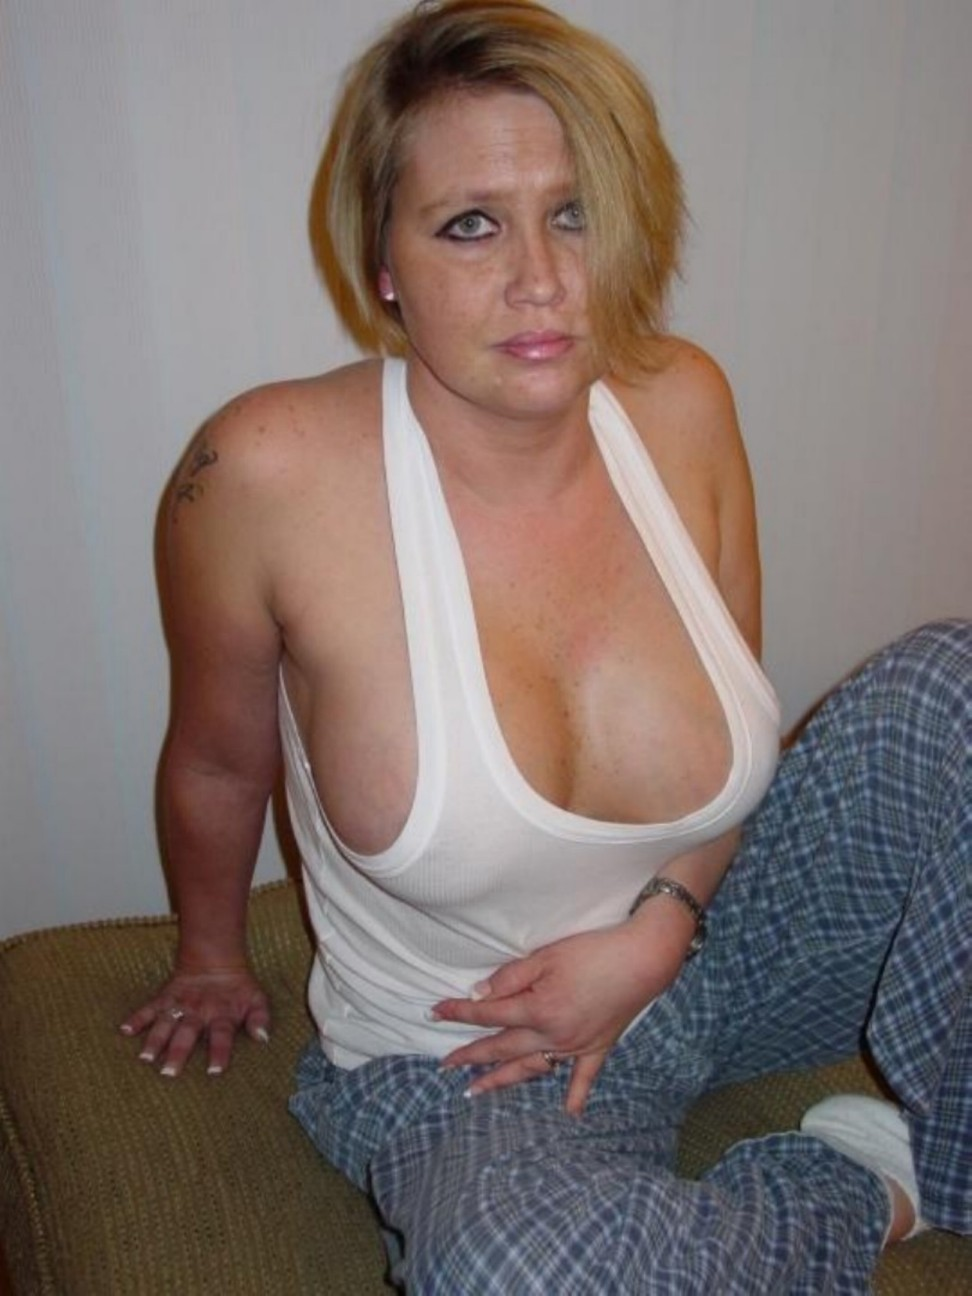 Gypsy new zealand stripper